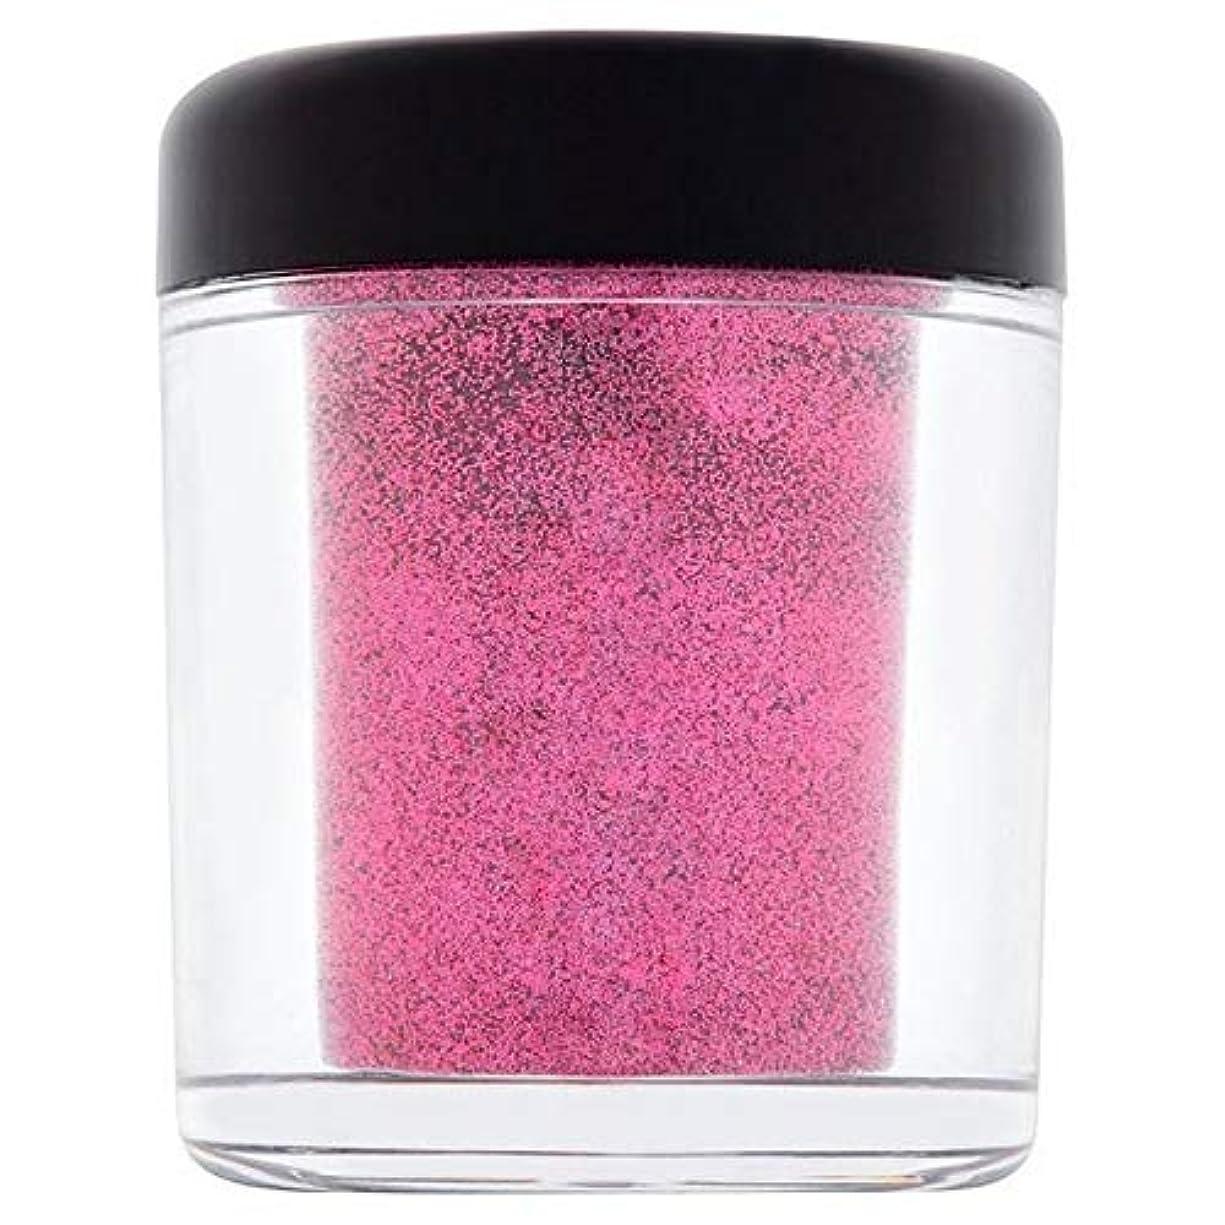 [Collection ] 収集グラムの結晶フェイス&ボディグリッター誘惑4 - Collection Glam Crystals Face & Body Glitter Temptation 4 [並行輸入品]